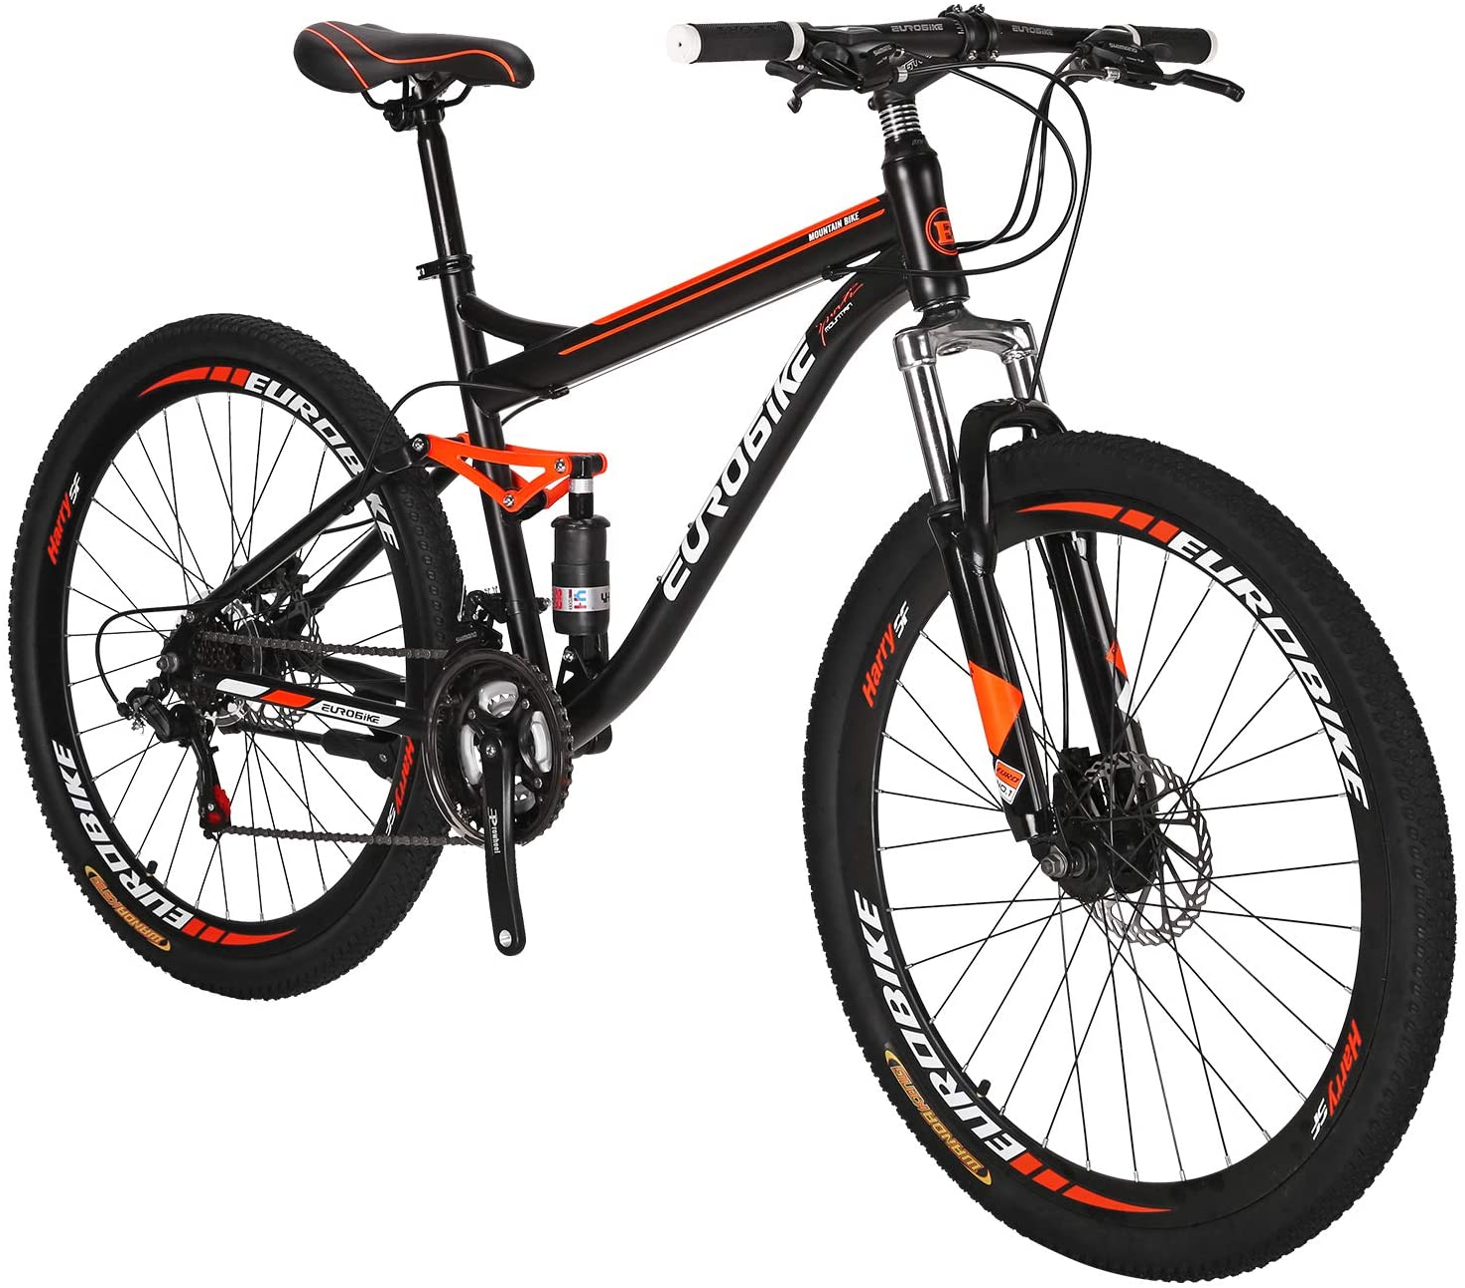 EUROBIKE Full Suspension Mountain Bike Best entry-level full-suspension mountain bike